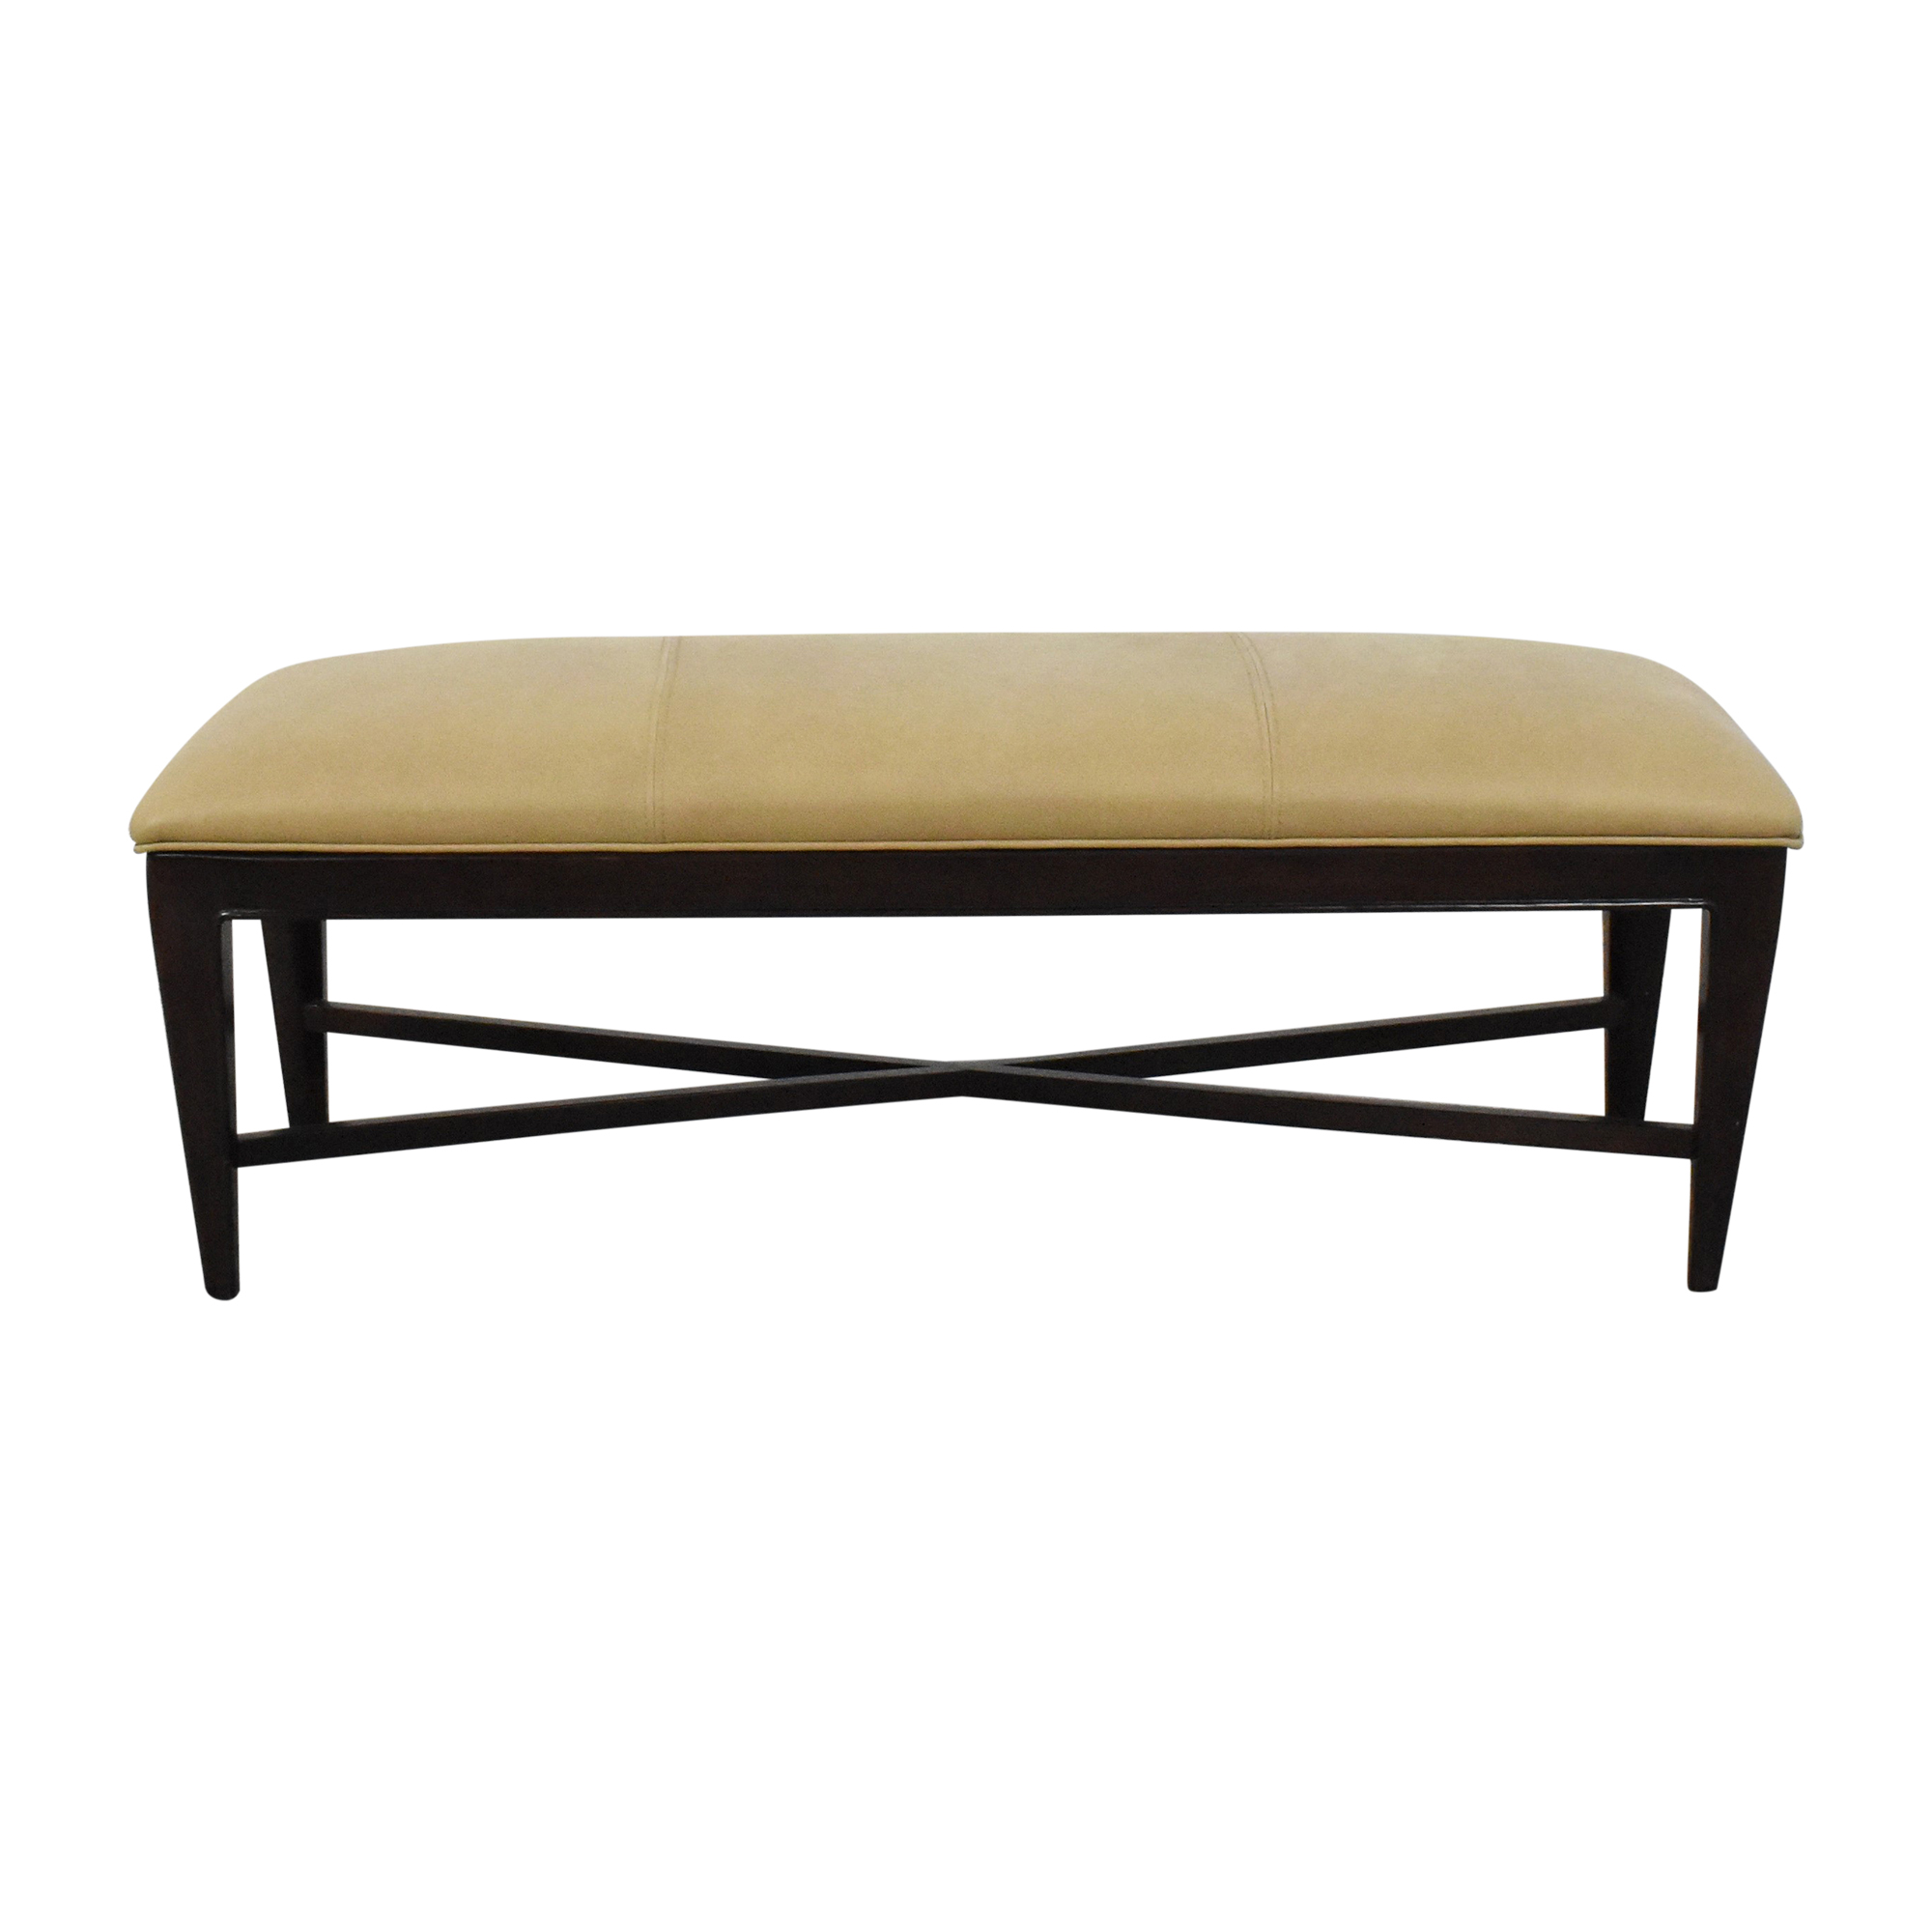 Thomasville Thomasville Upholstered Bench brown & tan